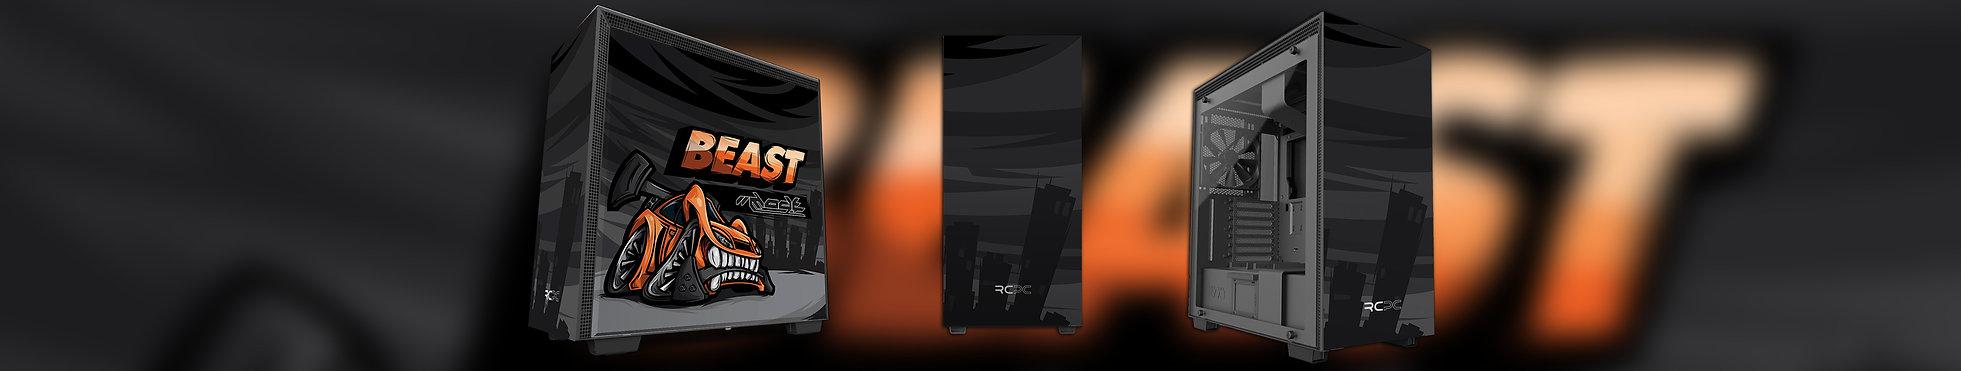 ICY BOMB BEAST MODE Case Banner.jpg